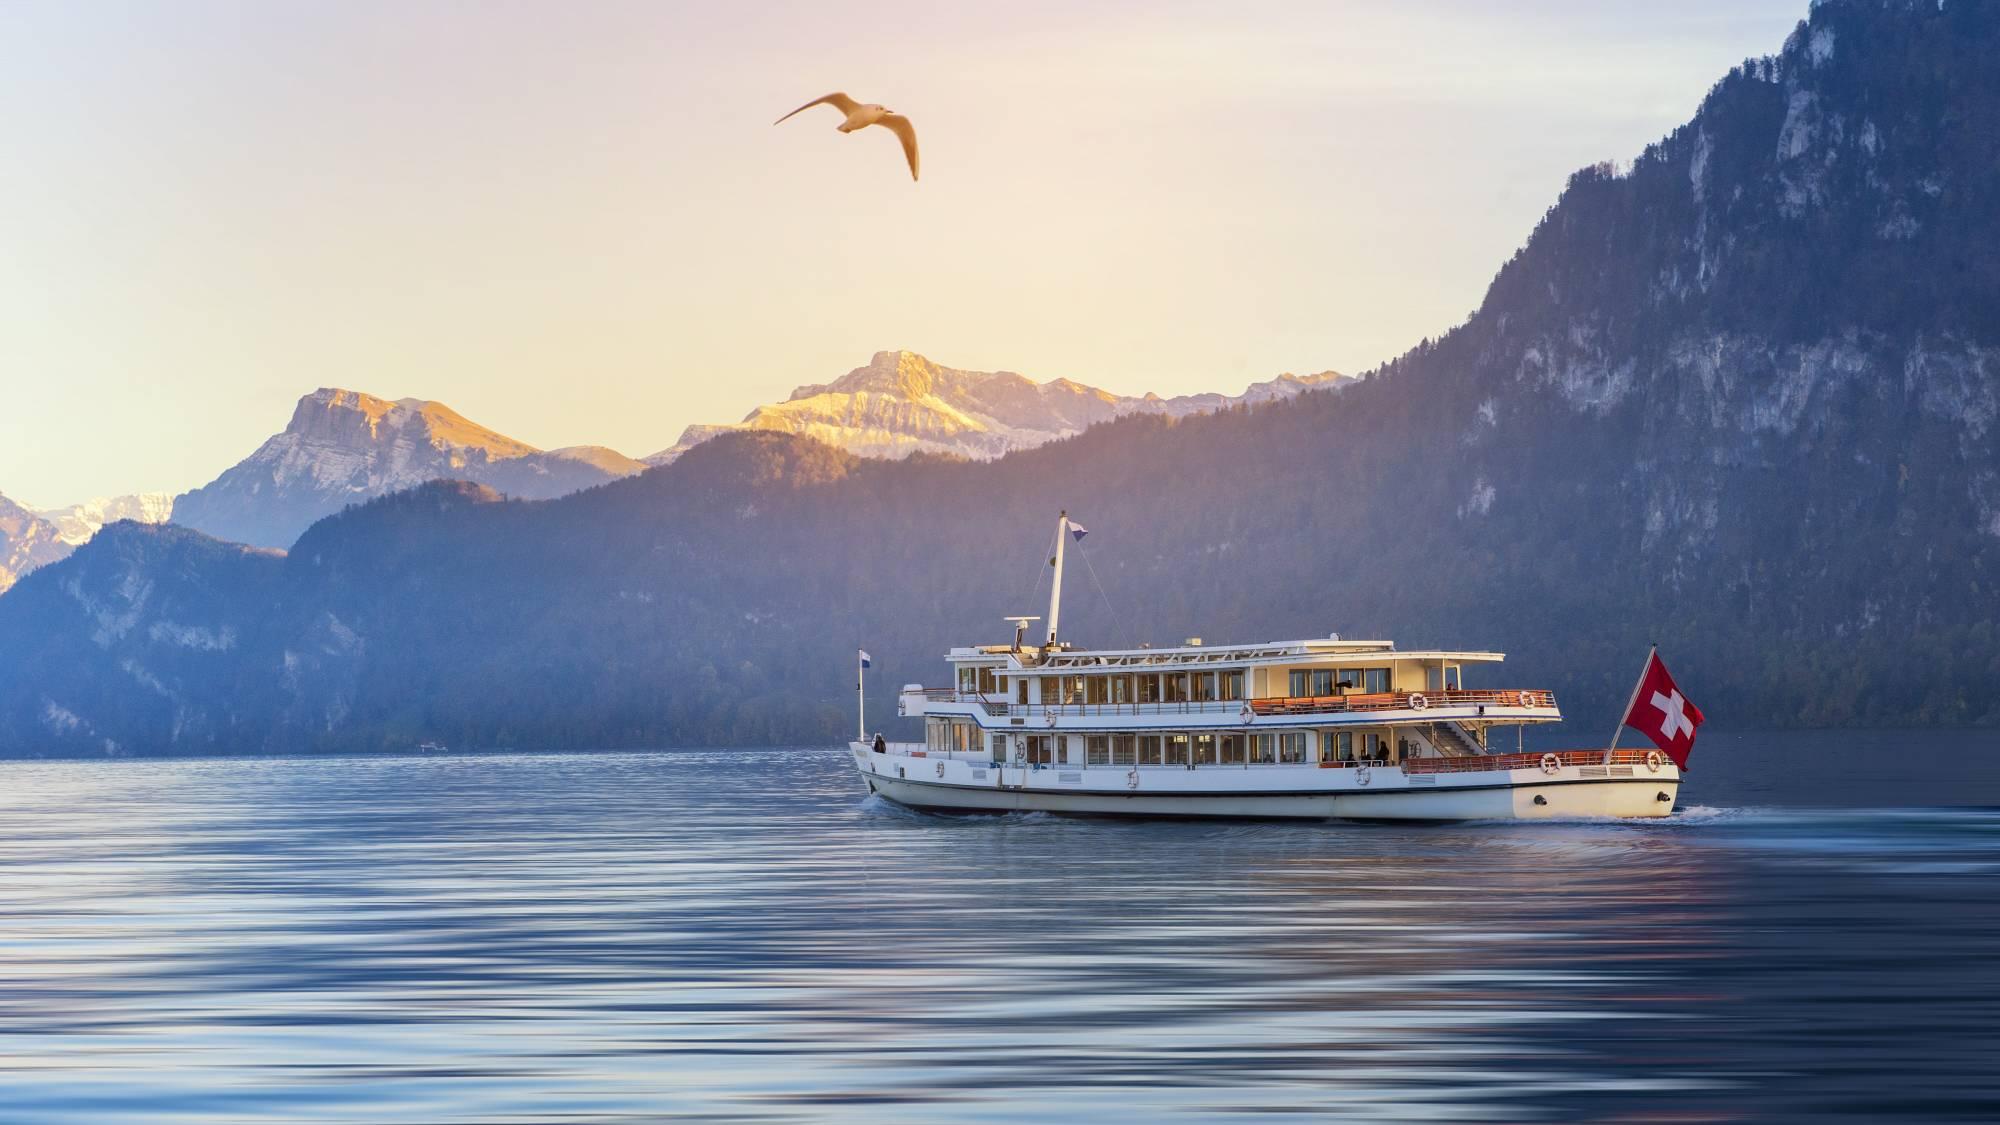 Swiss Riviera Tour - GVA Excursions